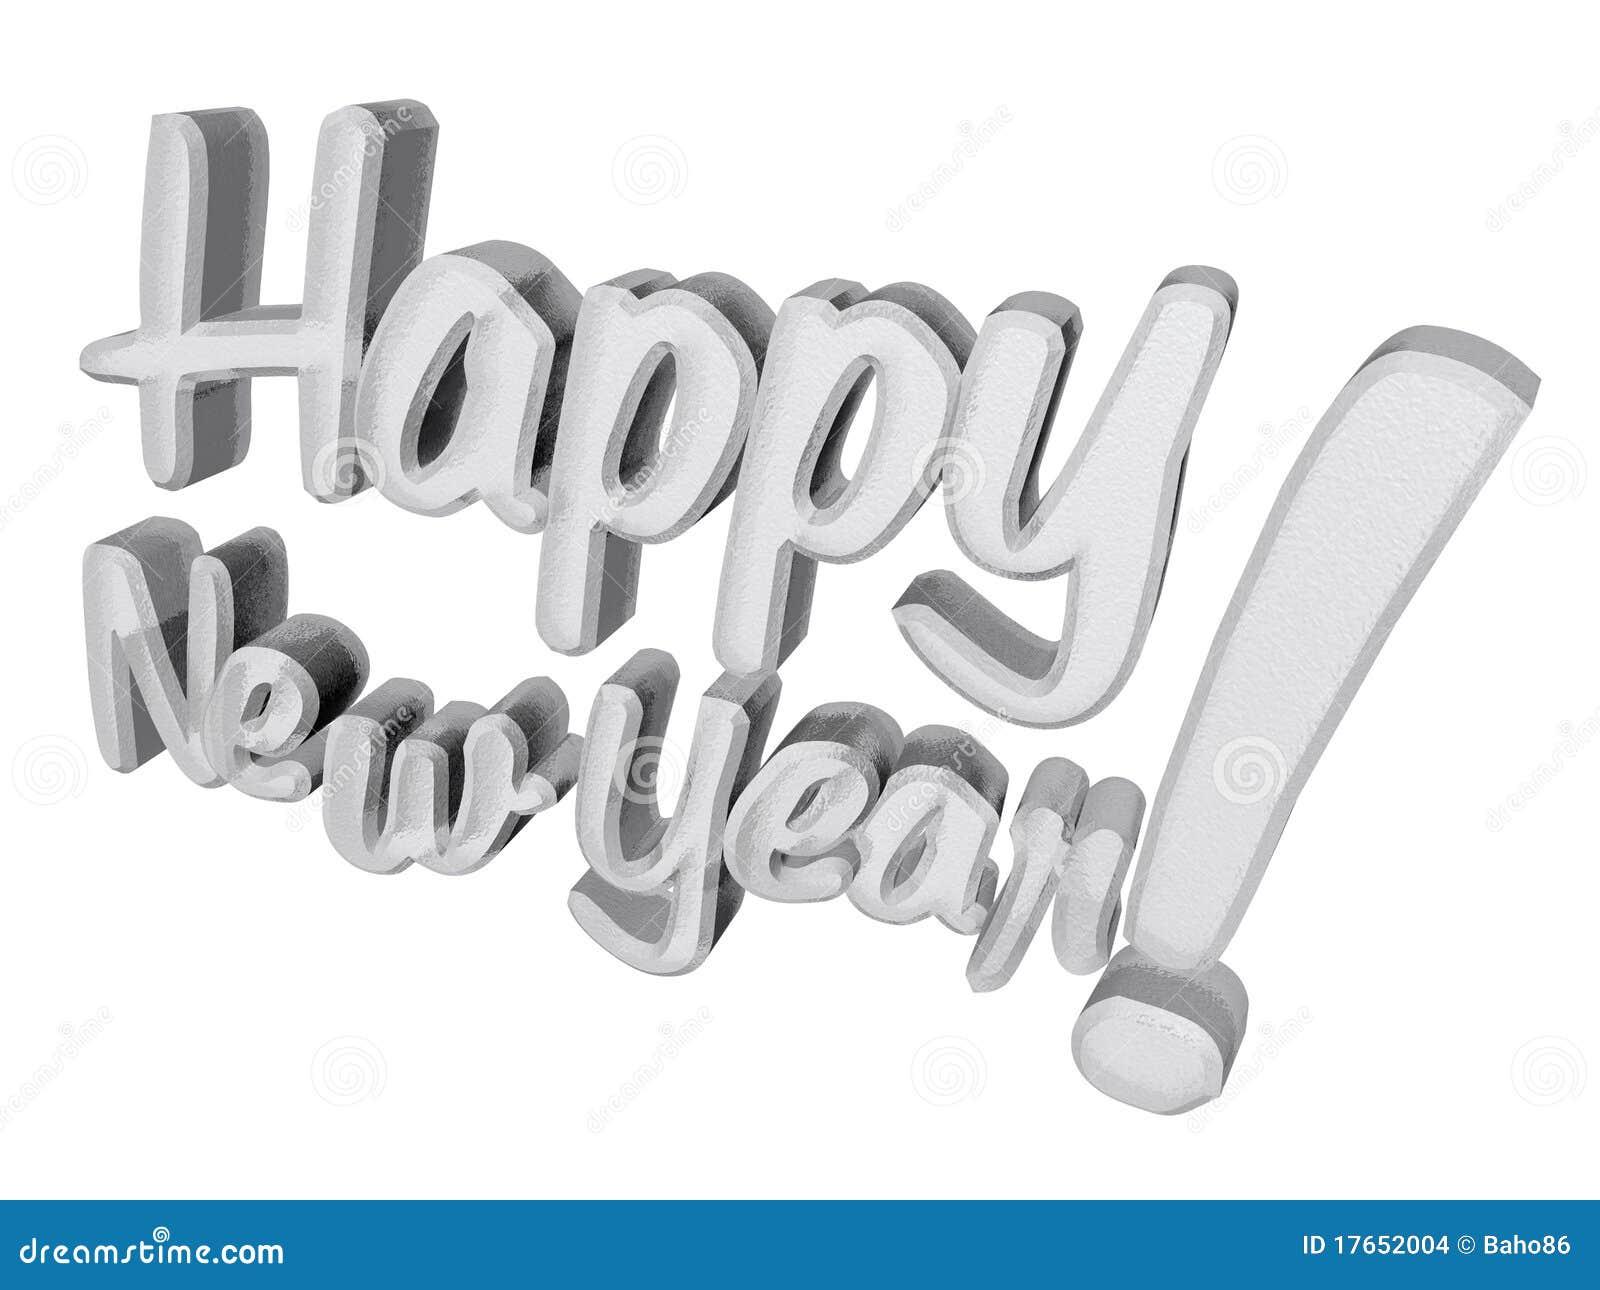 frozen happy new year in 3d